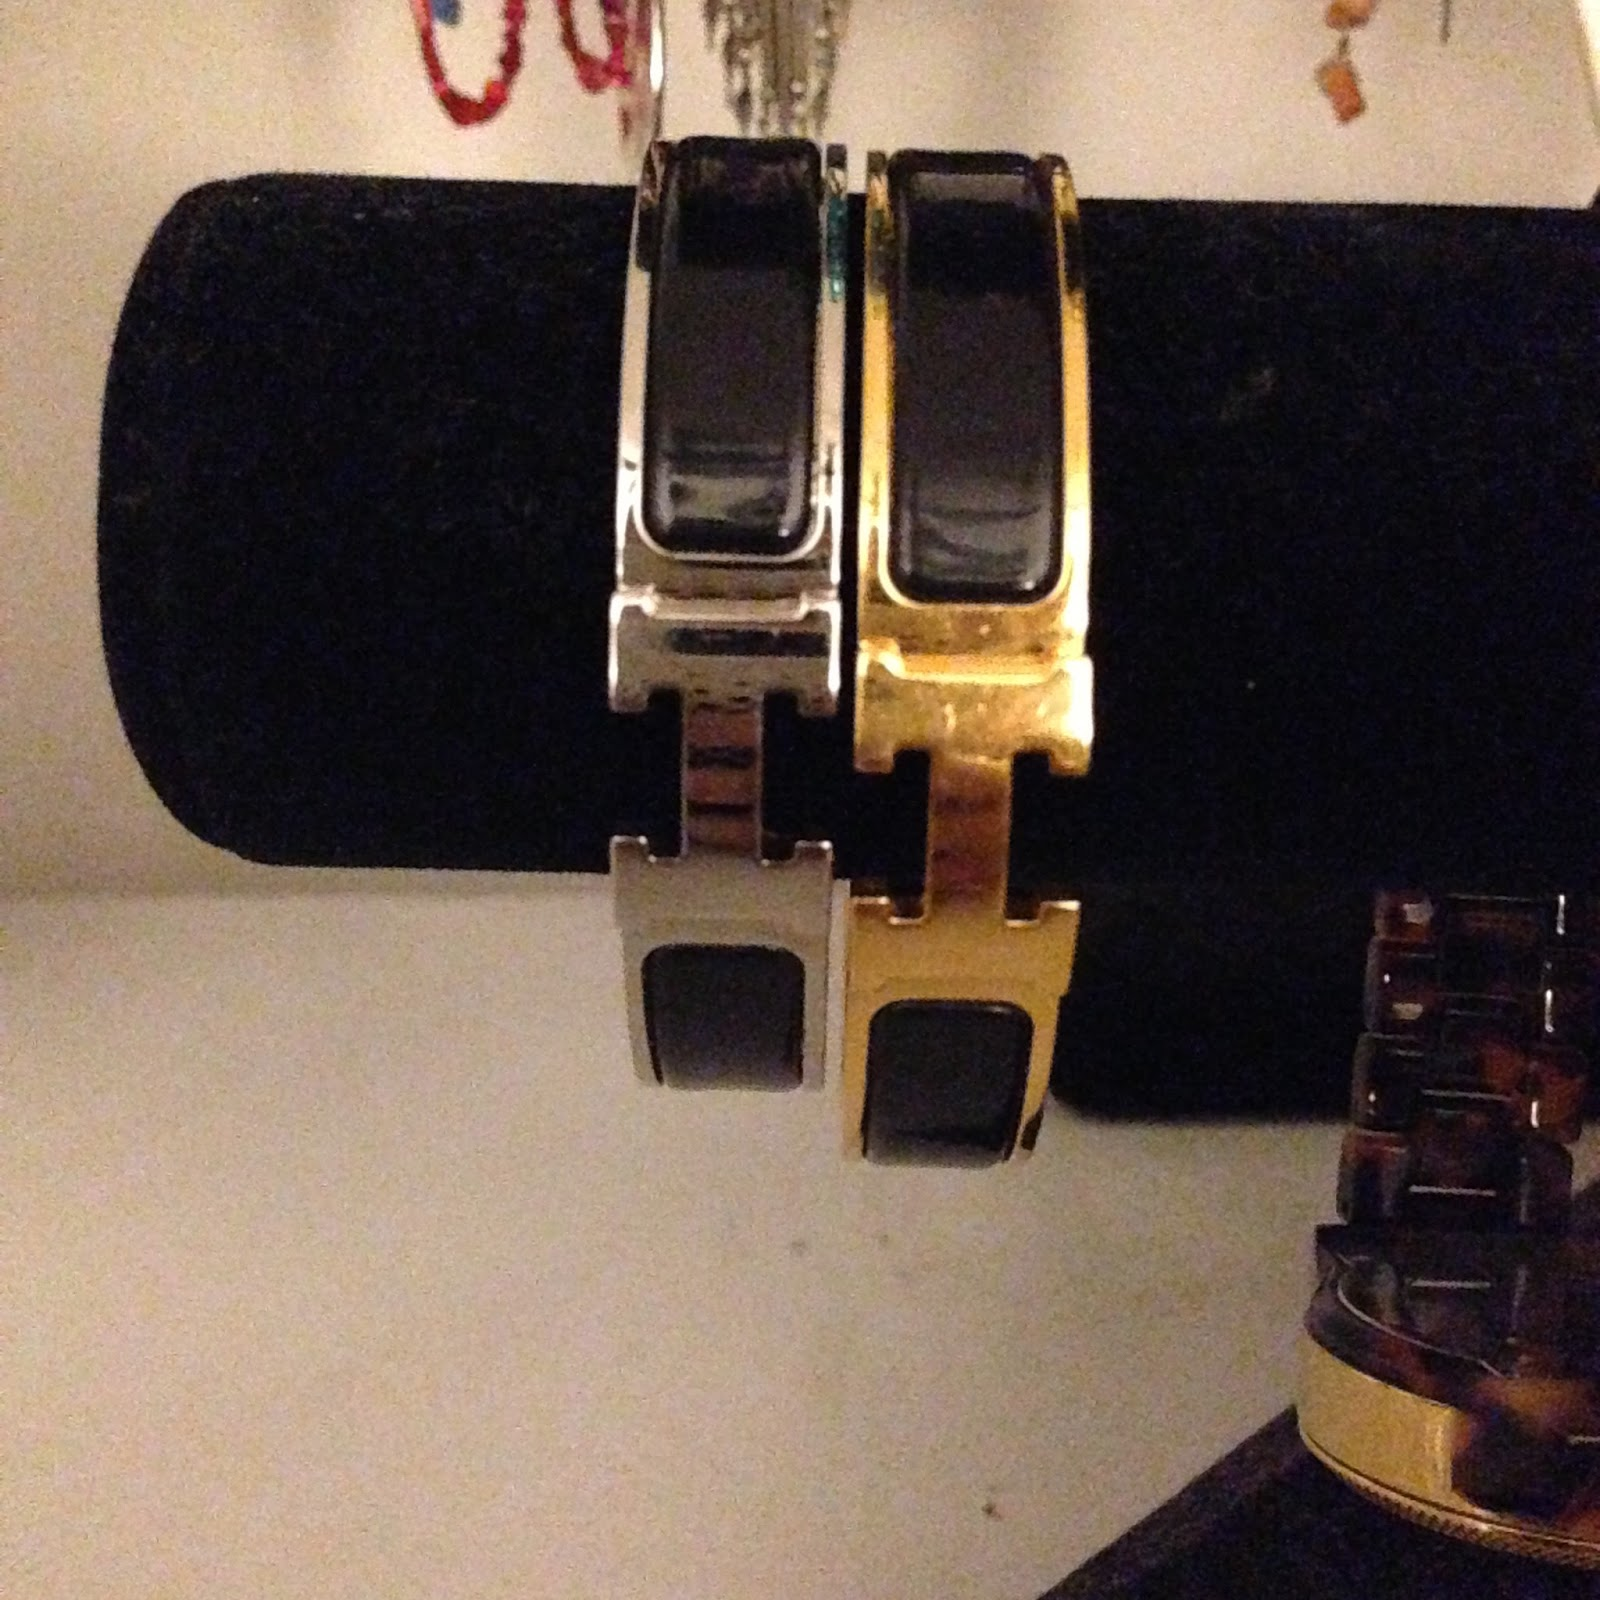 Herm 232 S Clic H Bracelet Pm Vs Gm Domesticated Me